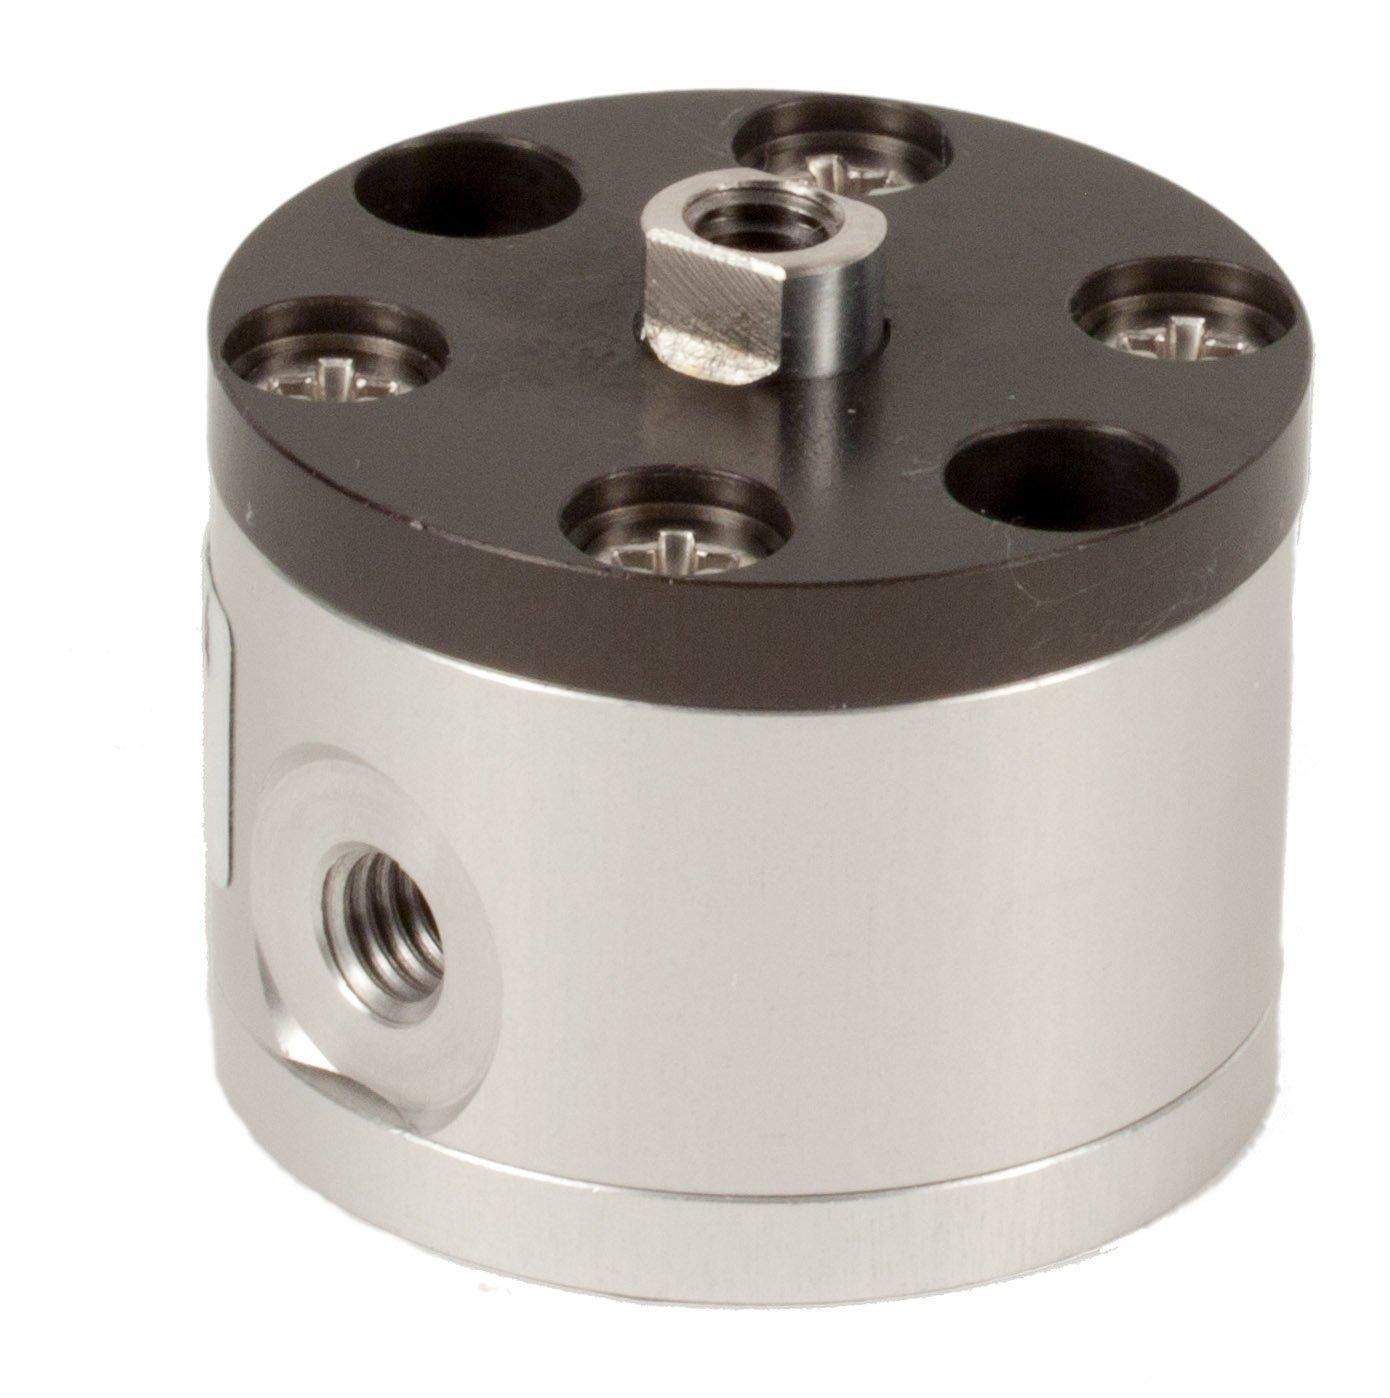 Fabco-Air C-5-X Original Pancake Cylinder, Double Acting, Maximum Pressure of 250 PSI, 1/2' Bore Diameter x 1/4' Stroke 1/2 Bore Diameter x 1/4 Stroke FAB   C-5-X